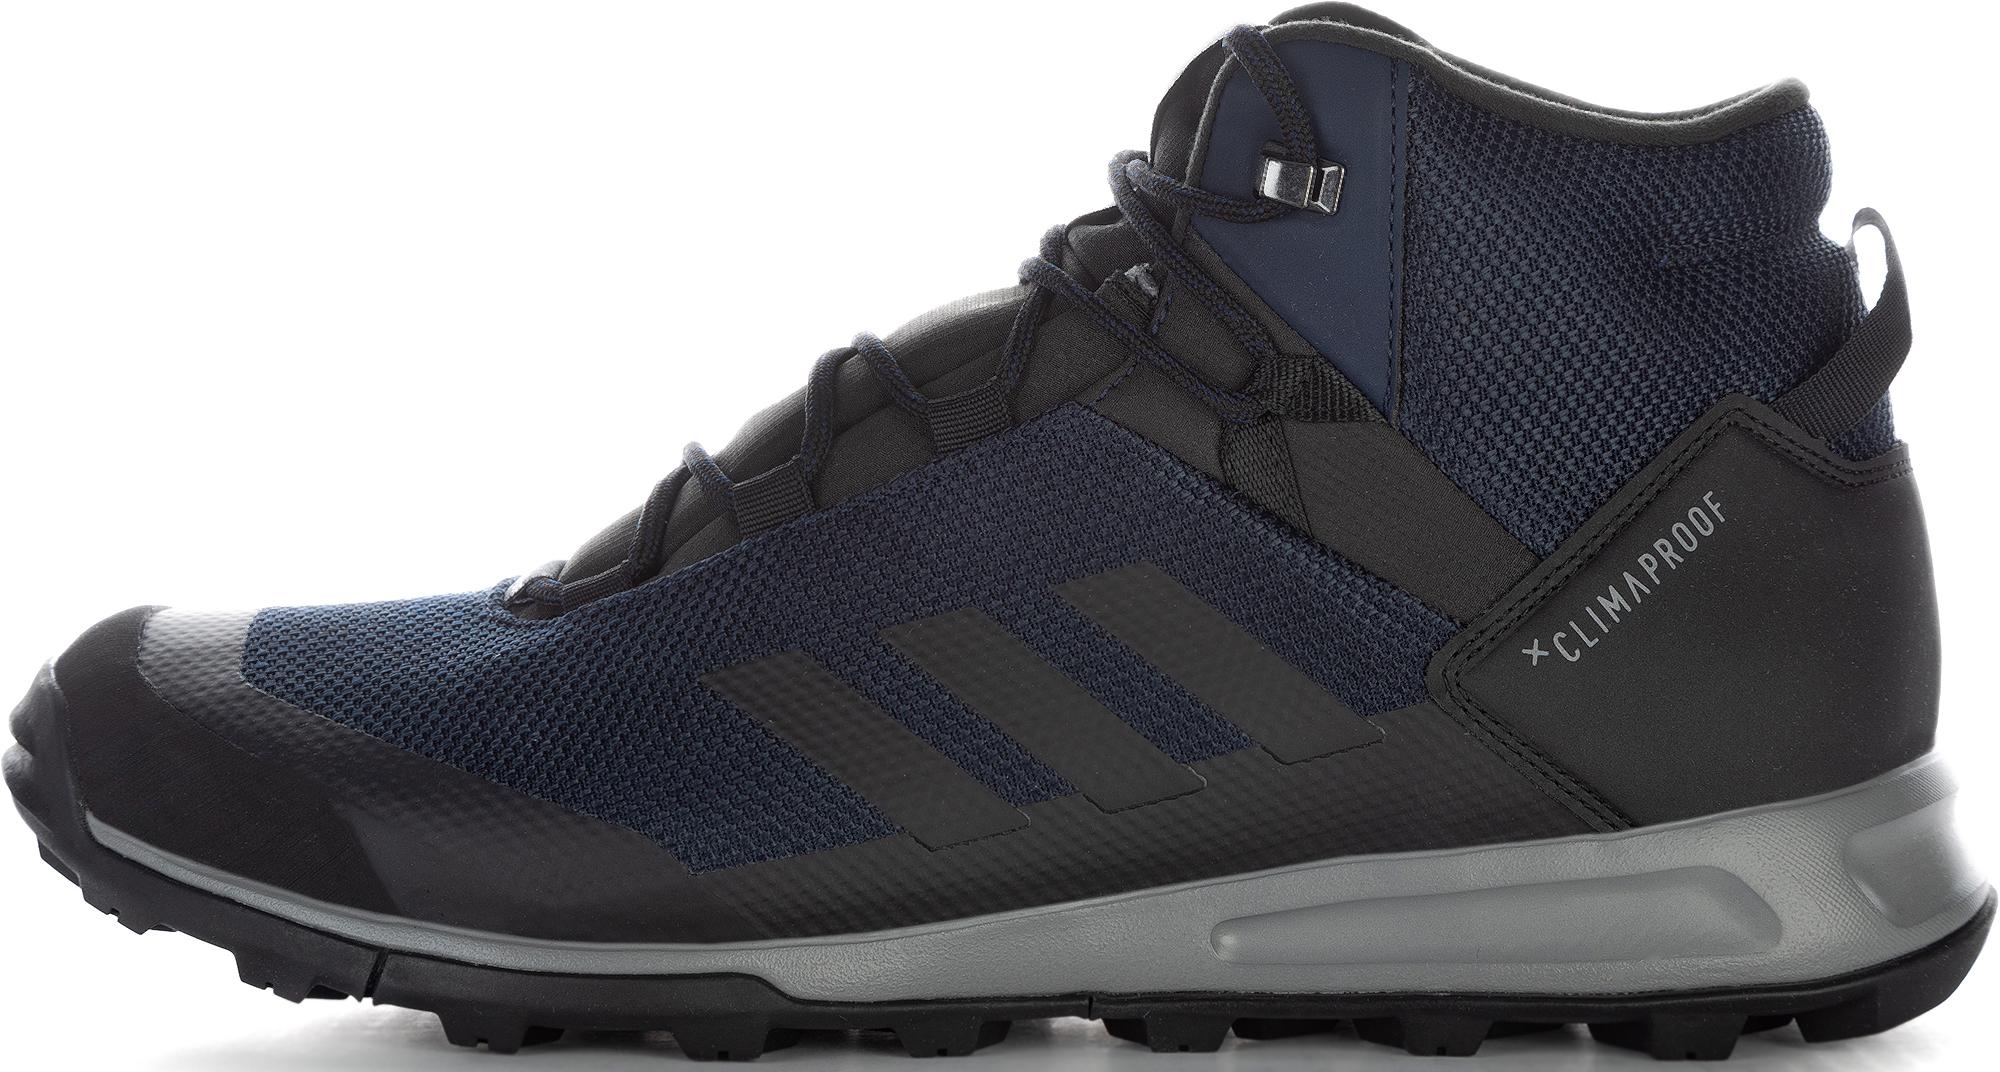 Adidas Ботинки мужские Adidas TERREX Tivid Mid ClimaProof, размер 40 adidas ботинки мужские adidas terrex tivid mid climaproof размер 40